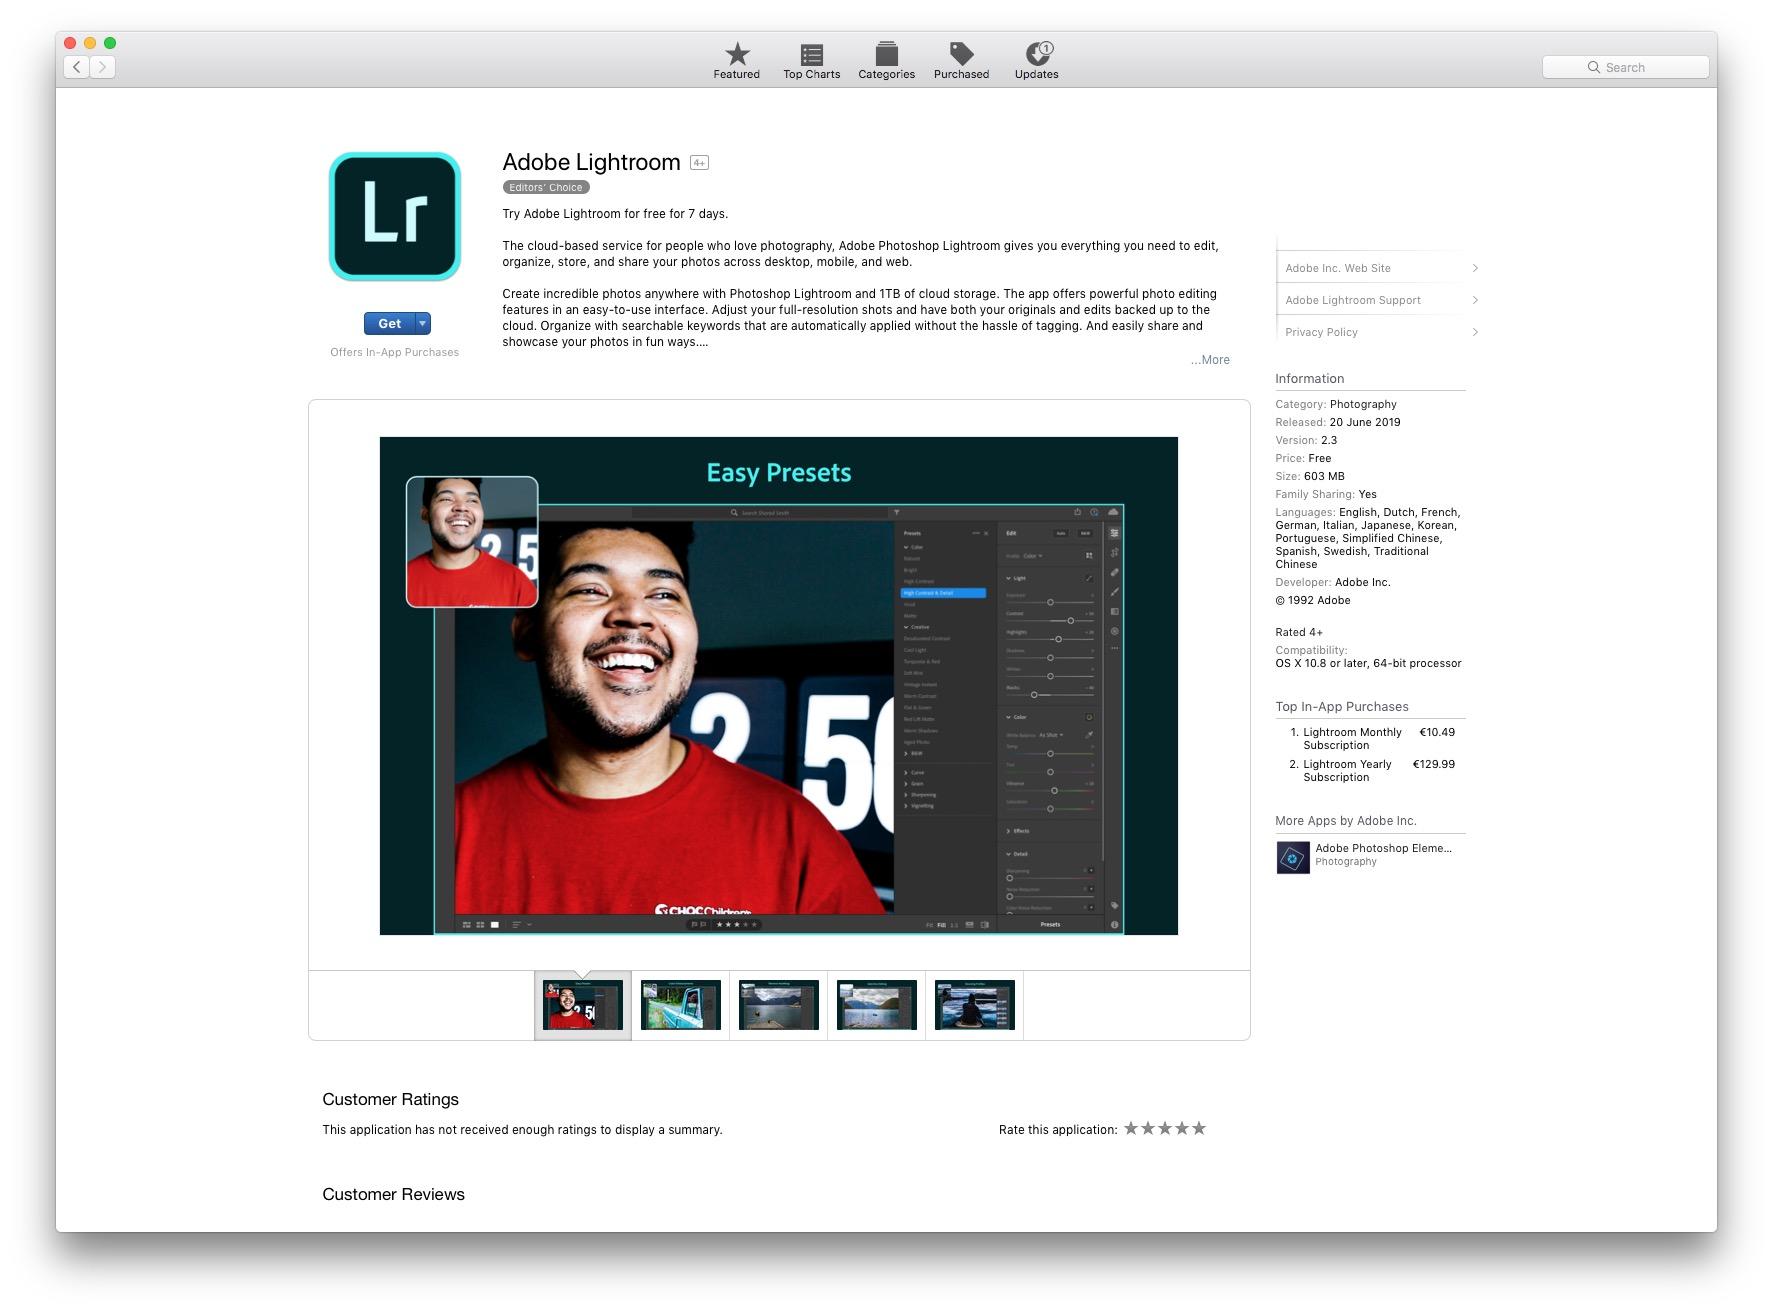 Lightroom on the Mac App Store